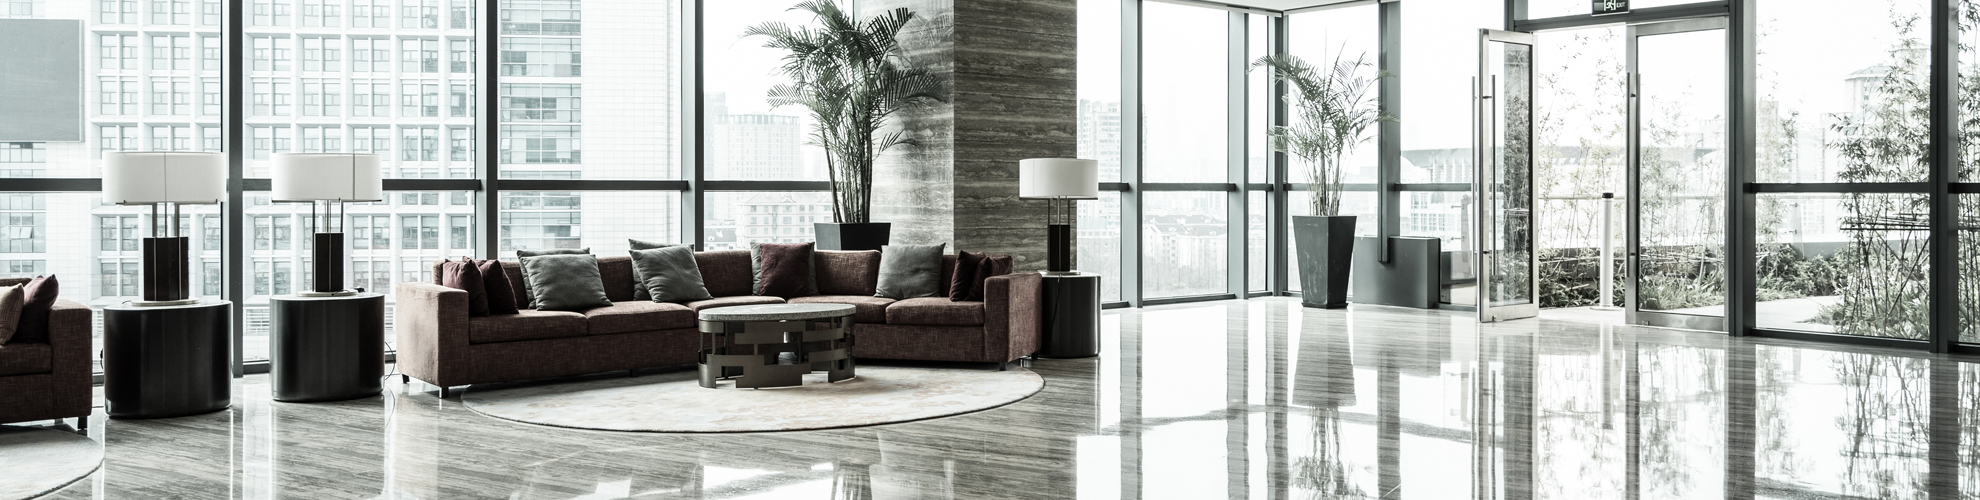 Pavimenti in marmo moderni